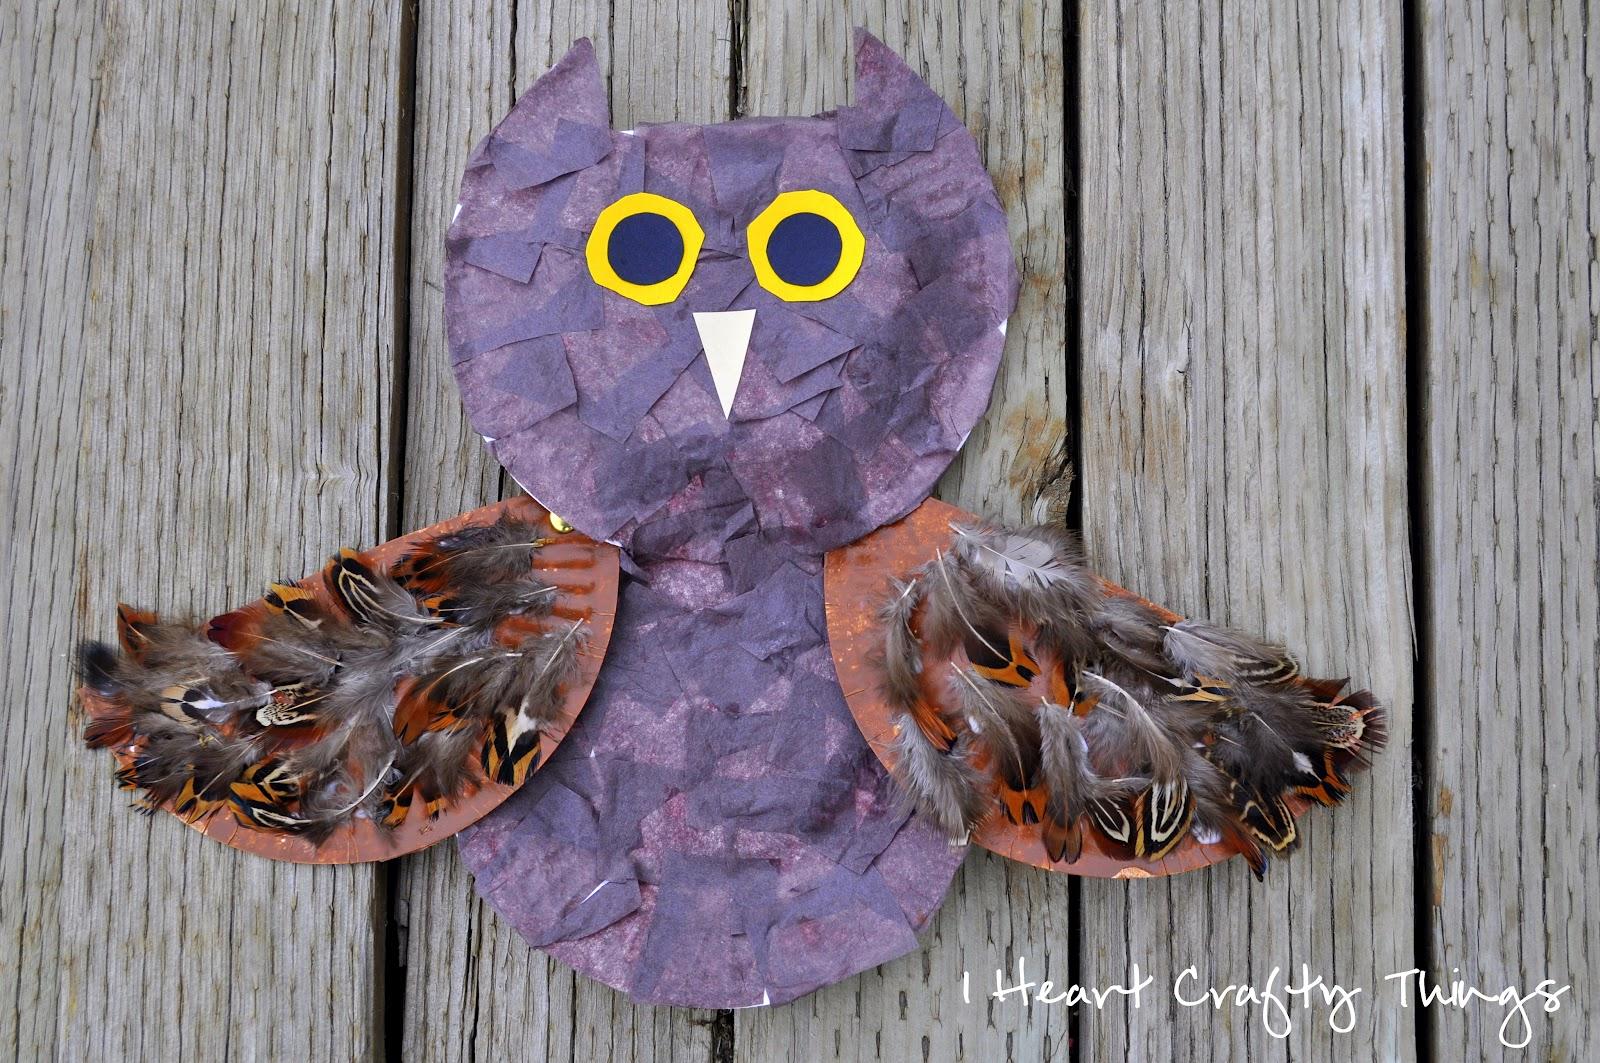 A Textured Owl Craft & A Textured Owl Craft | I Heart Crafty Things